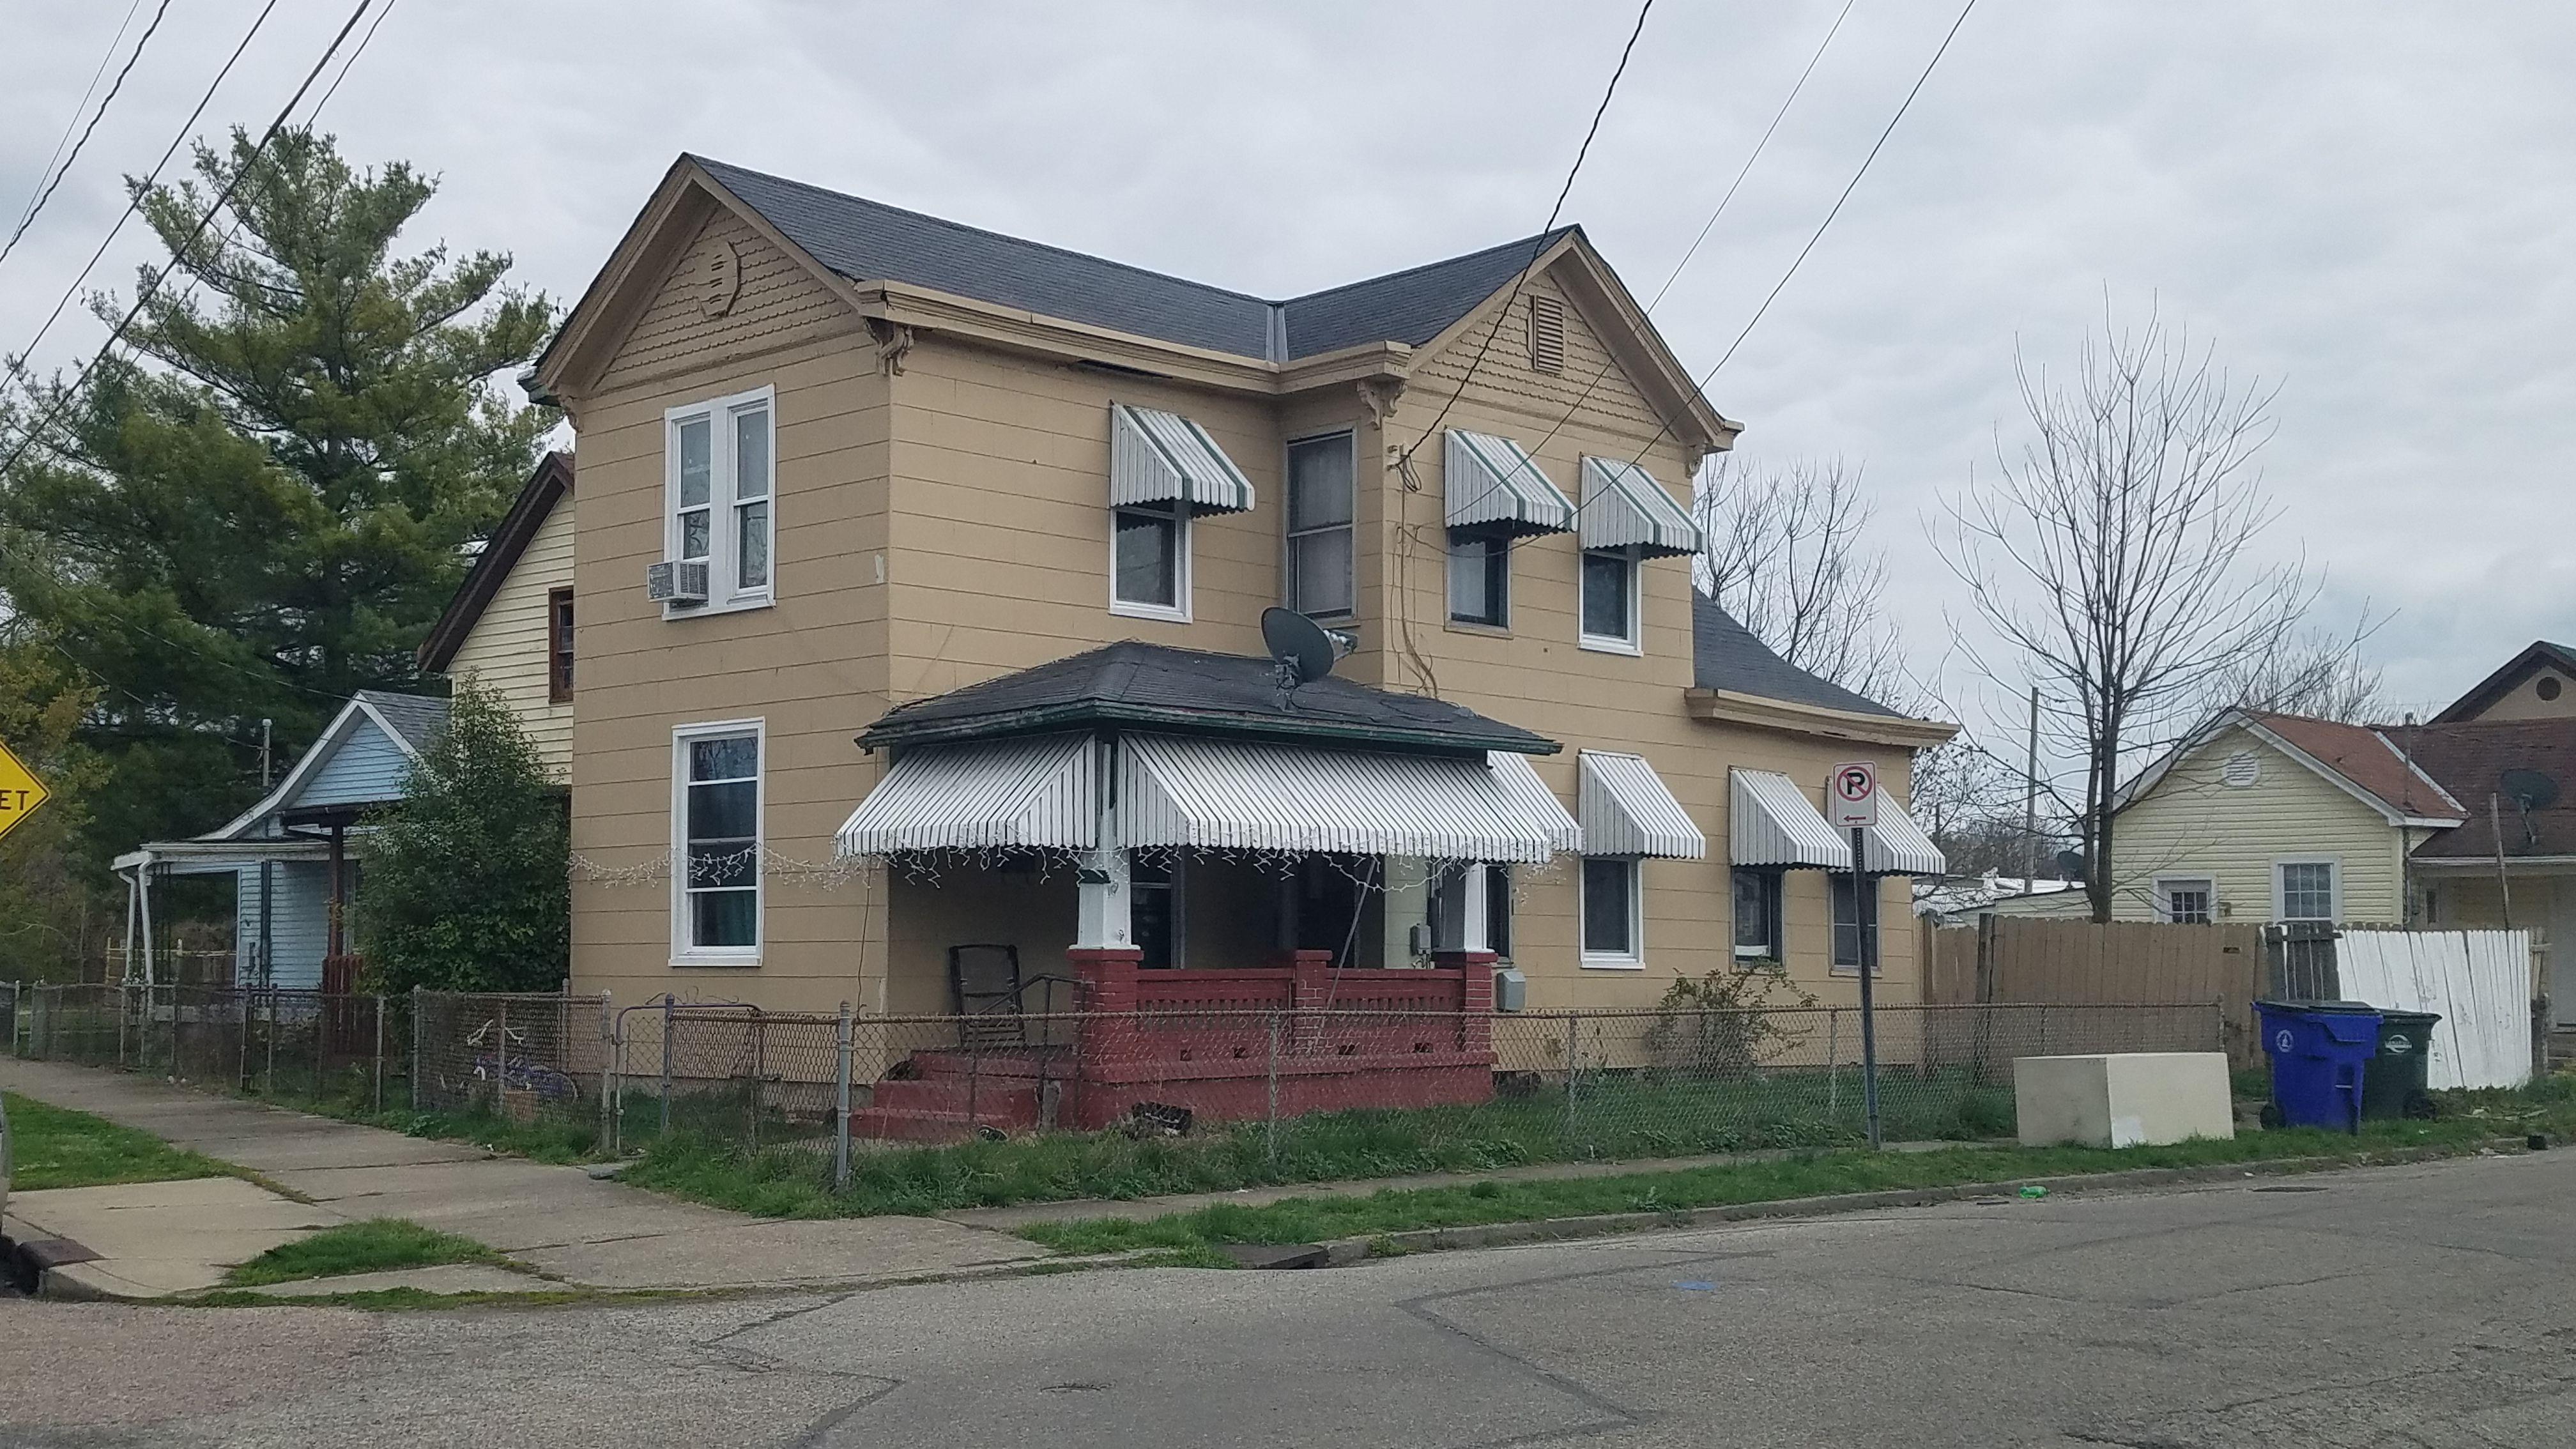 1301 Ludlow St, Hamilton, OH